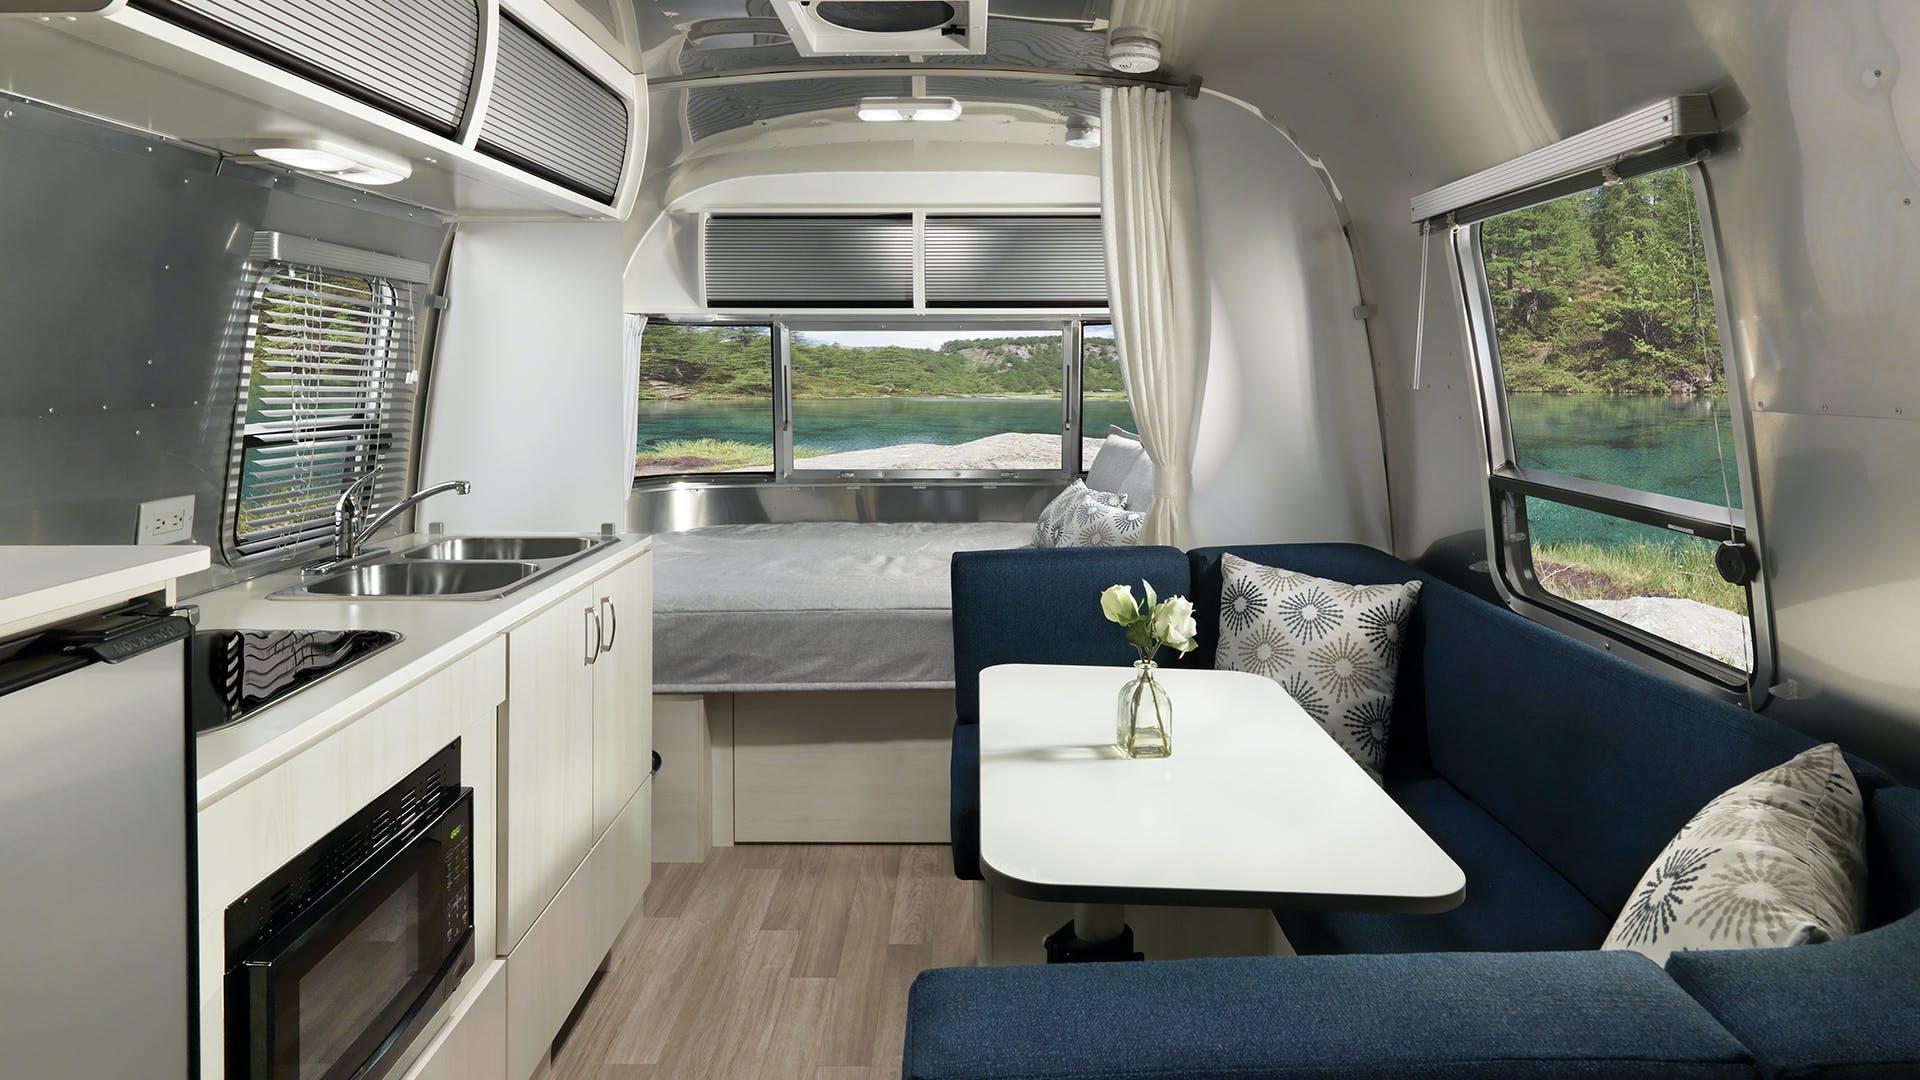 2020 Airstream Bambi Ocean Decor 22FB